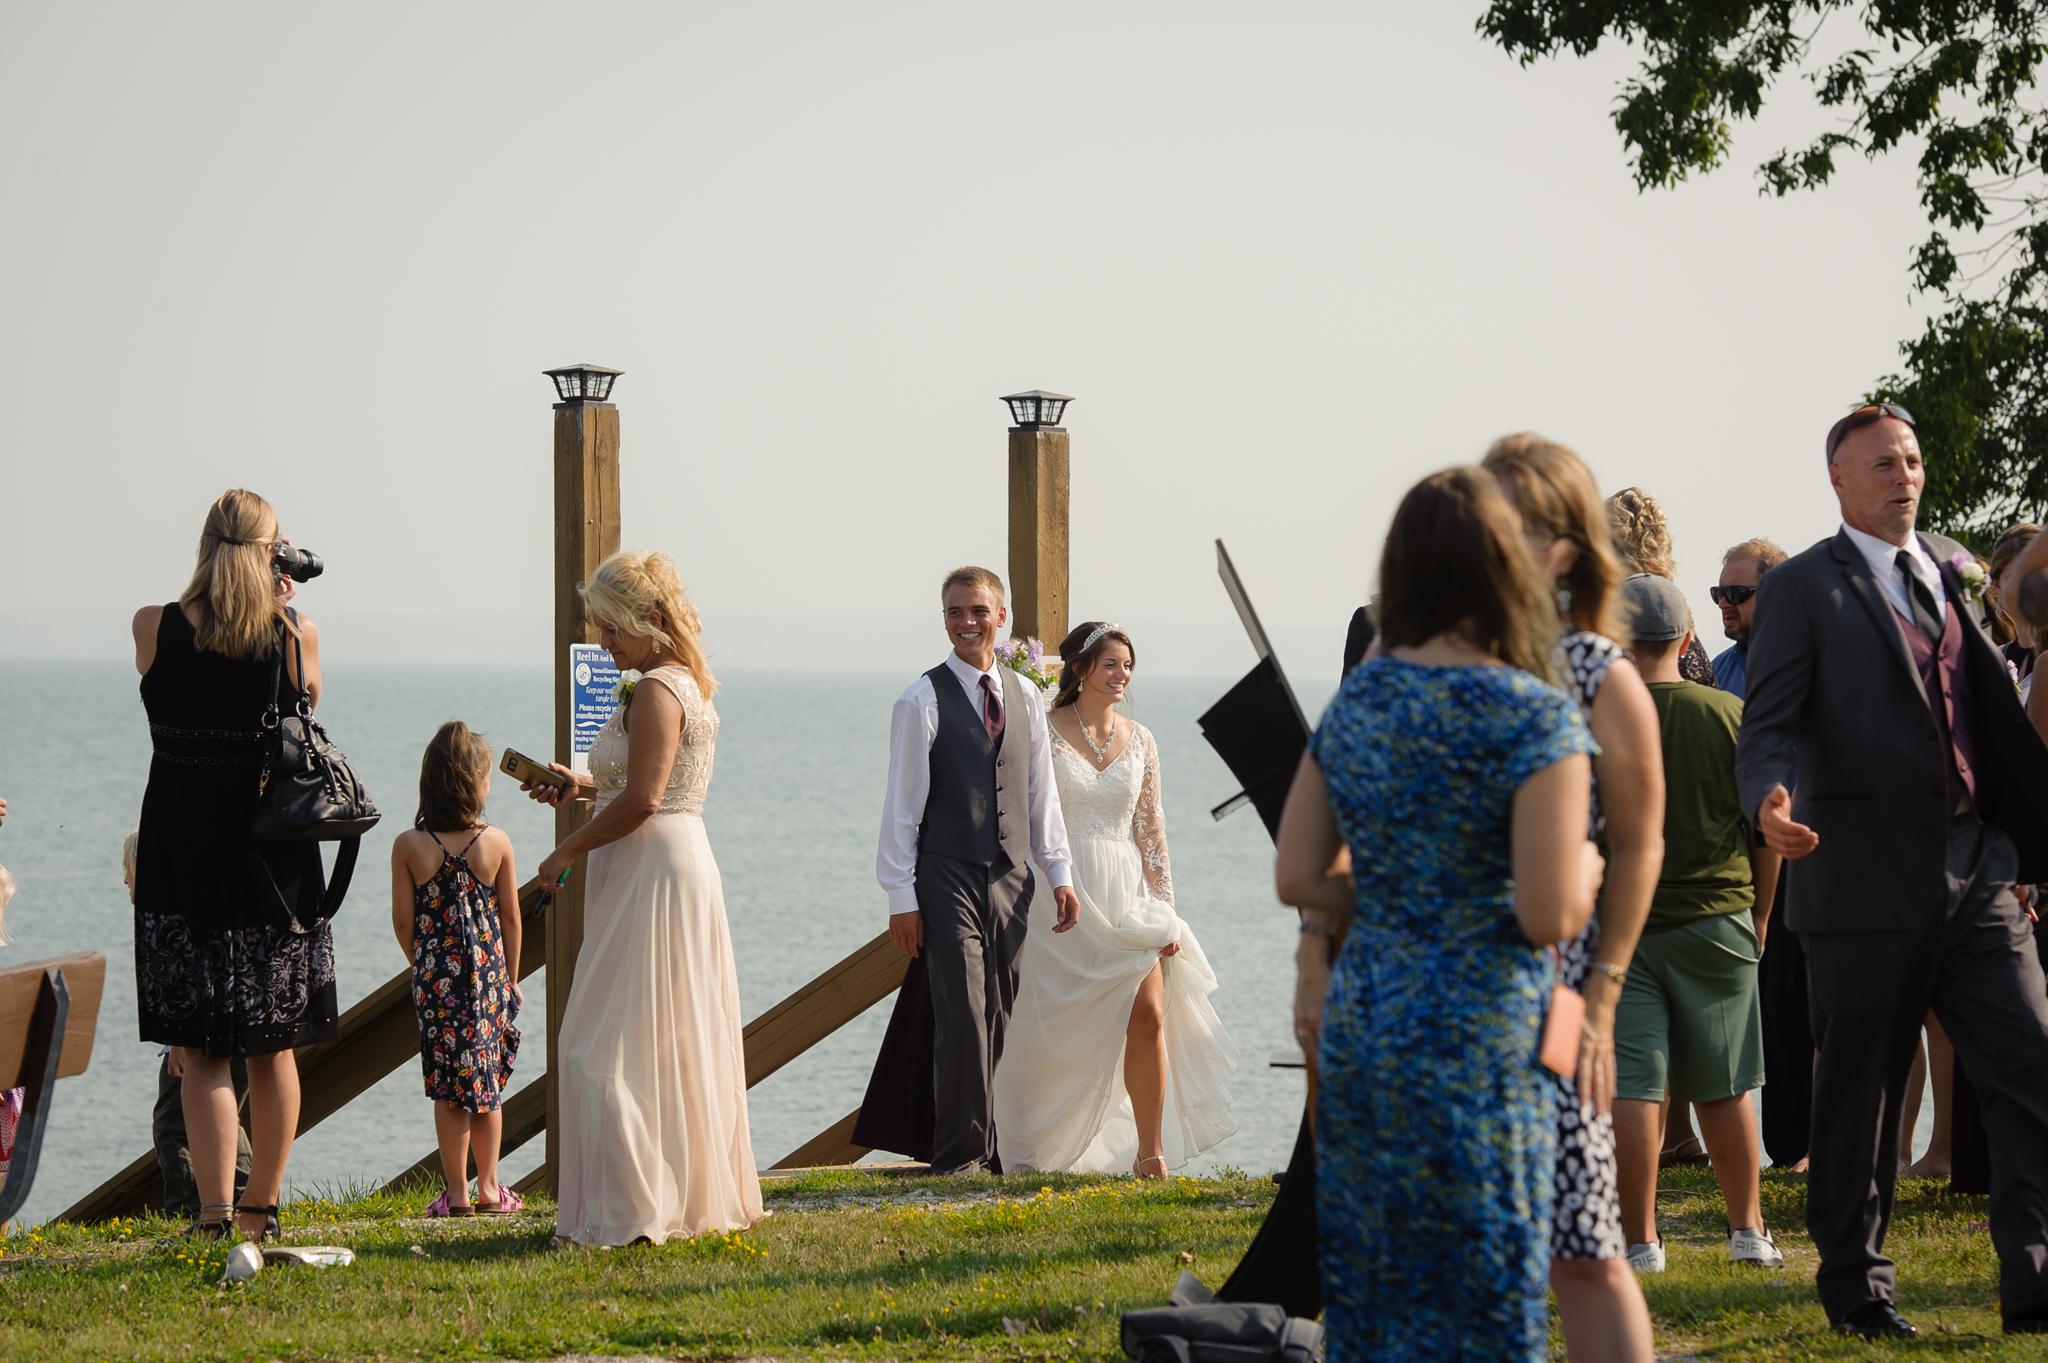 38-ashland washburn wedding photography700_5533.jpg